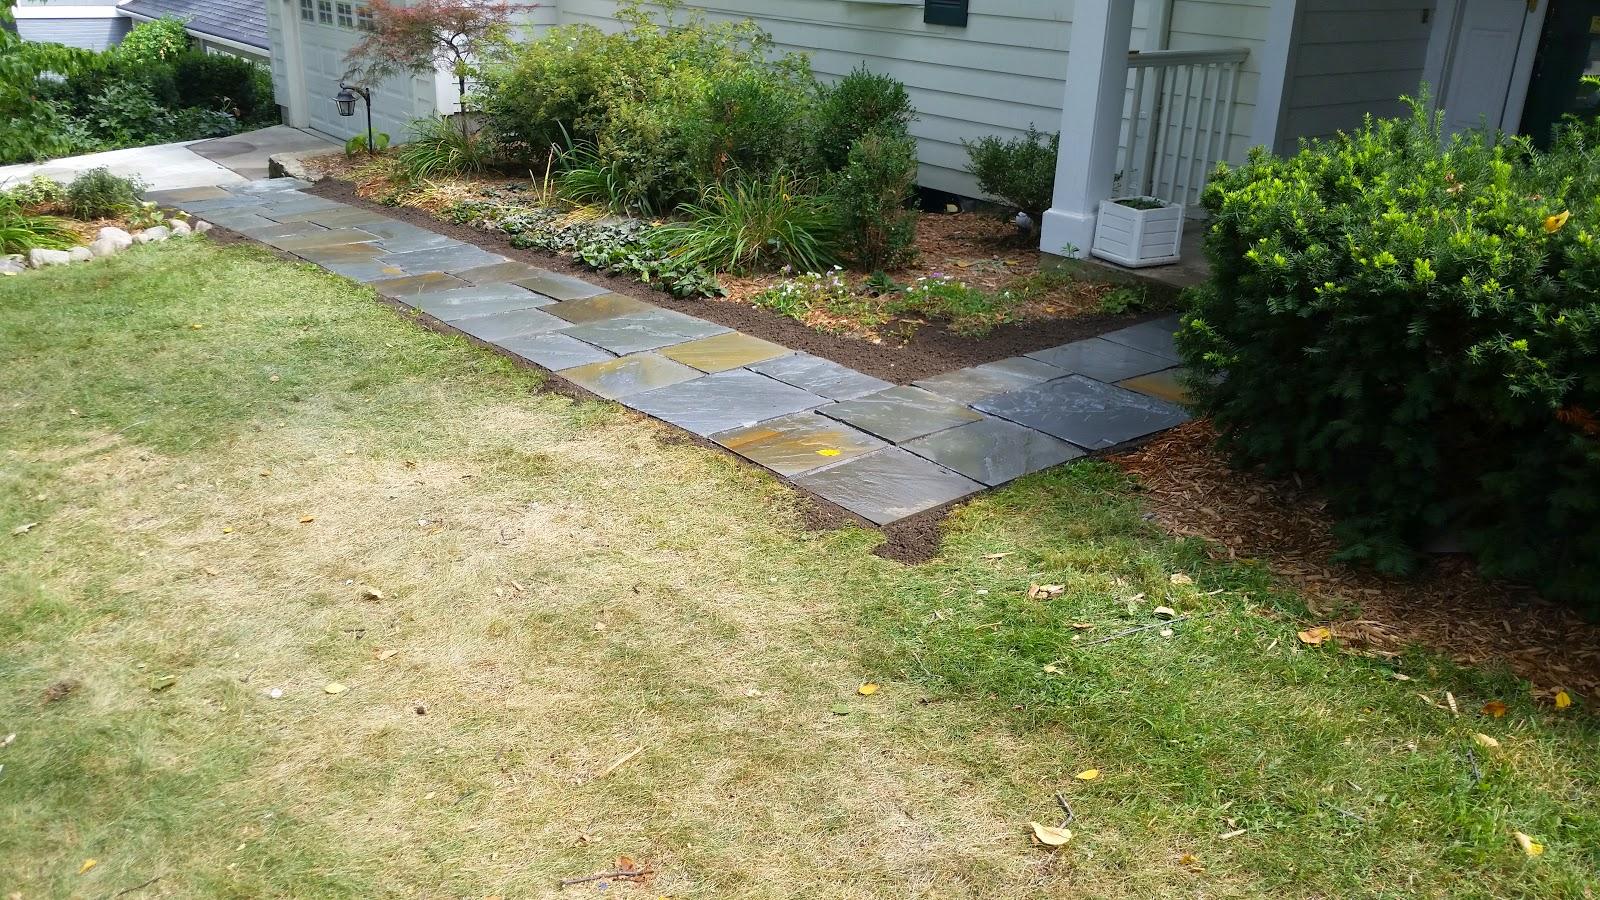 Brick Paver Patio Design, Installation, and Maintenance